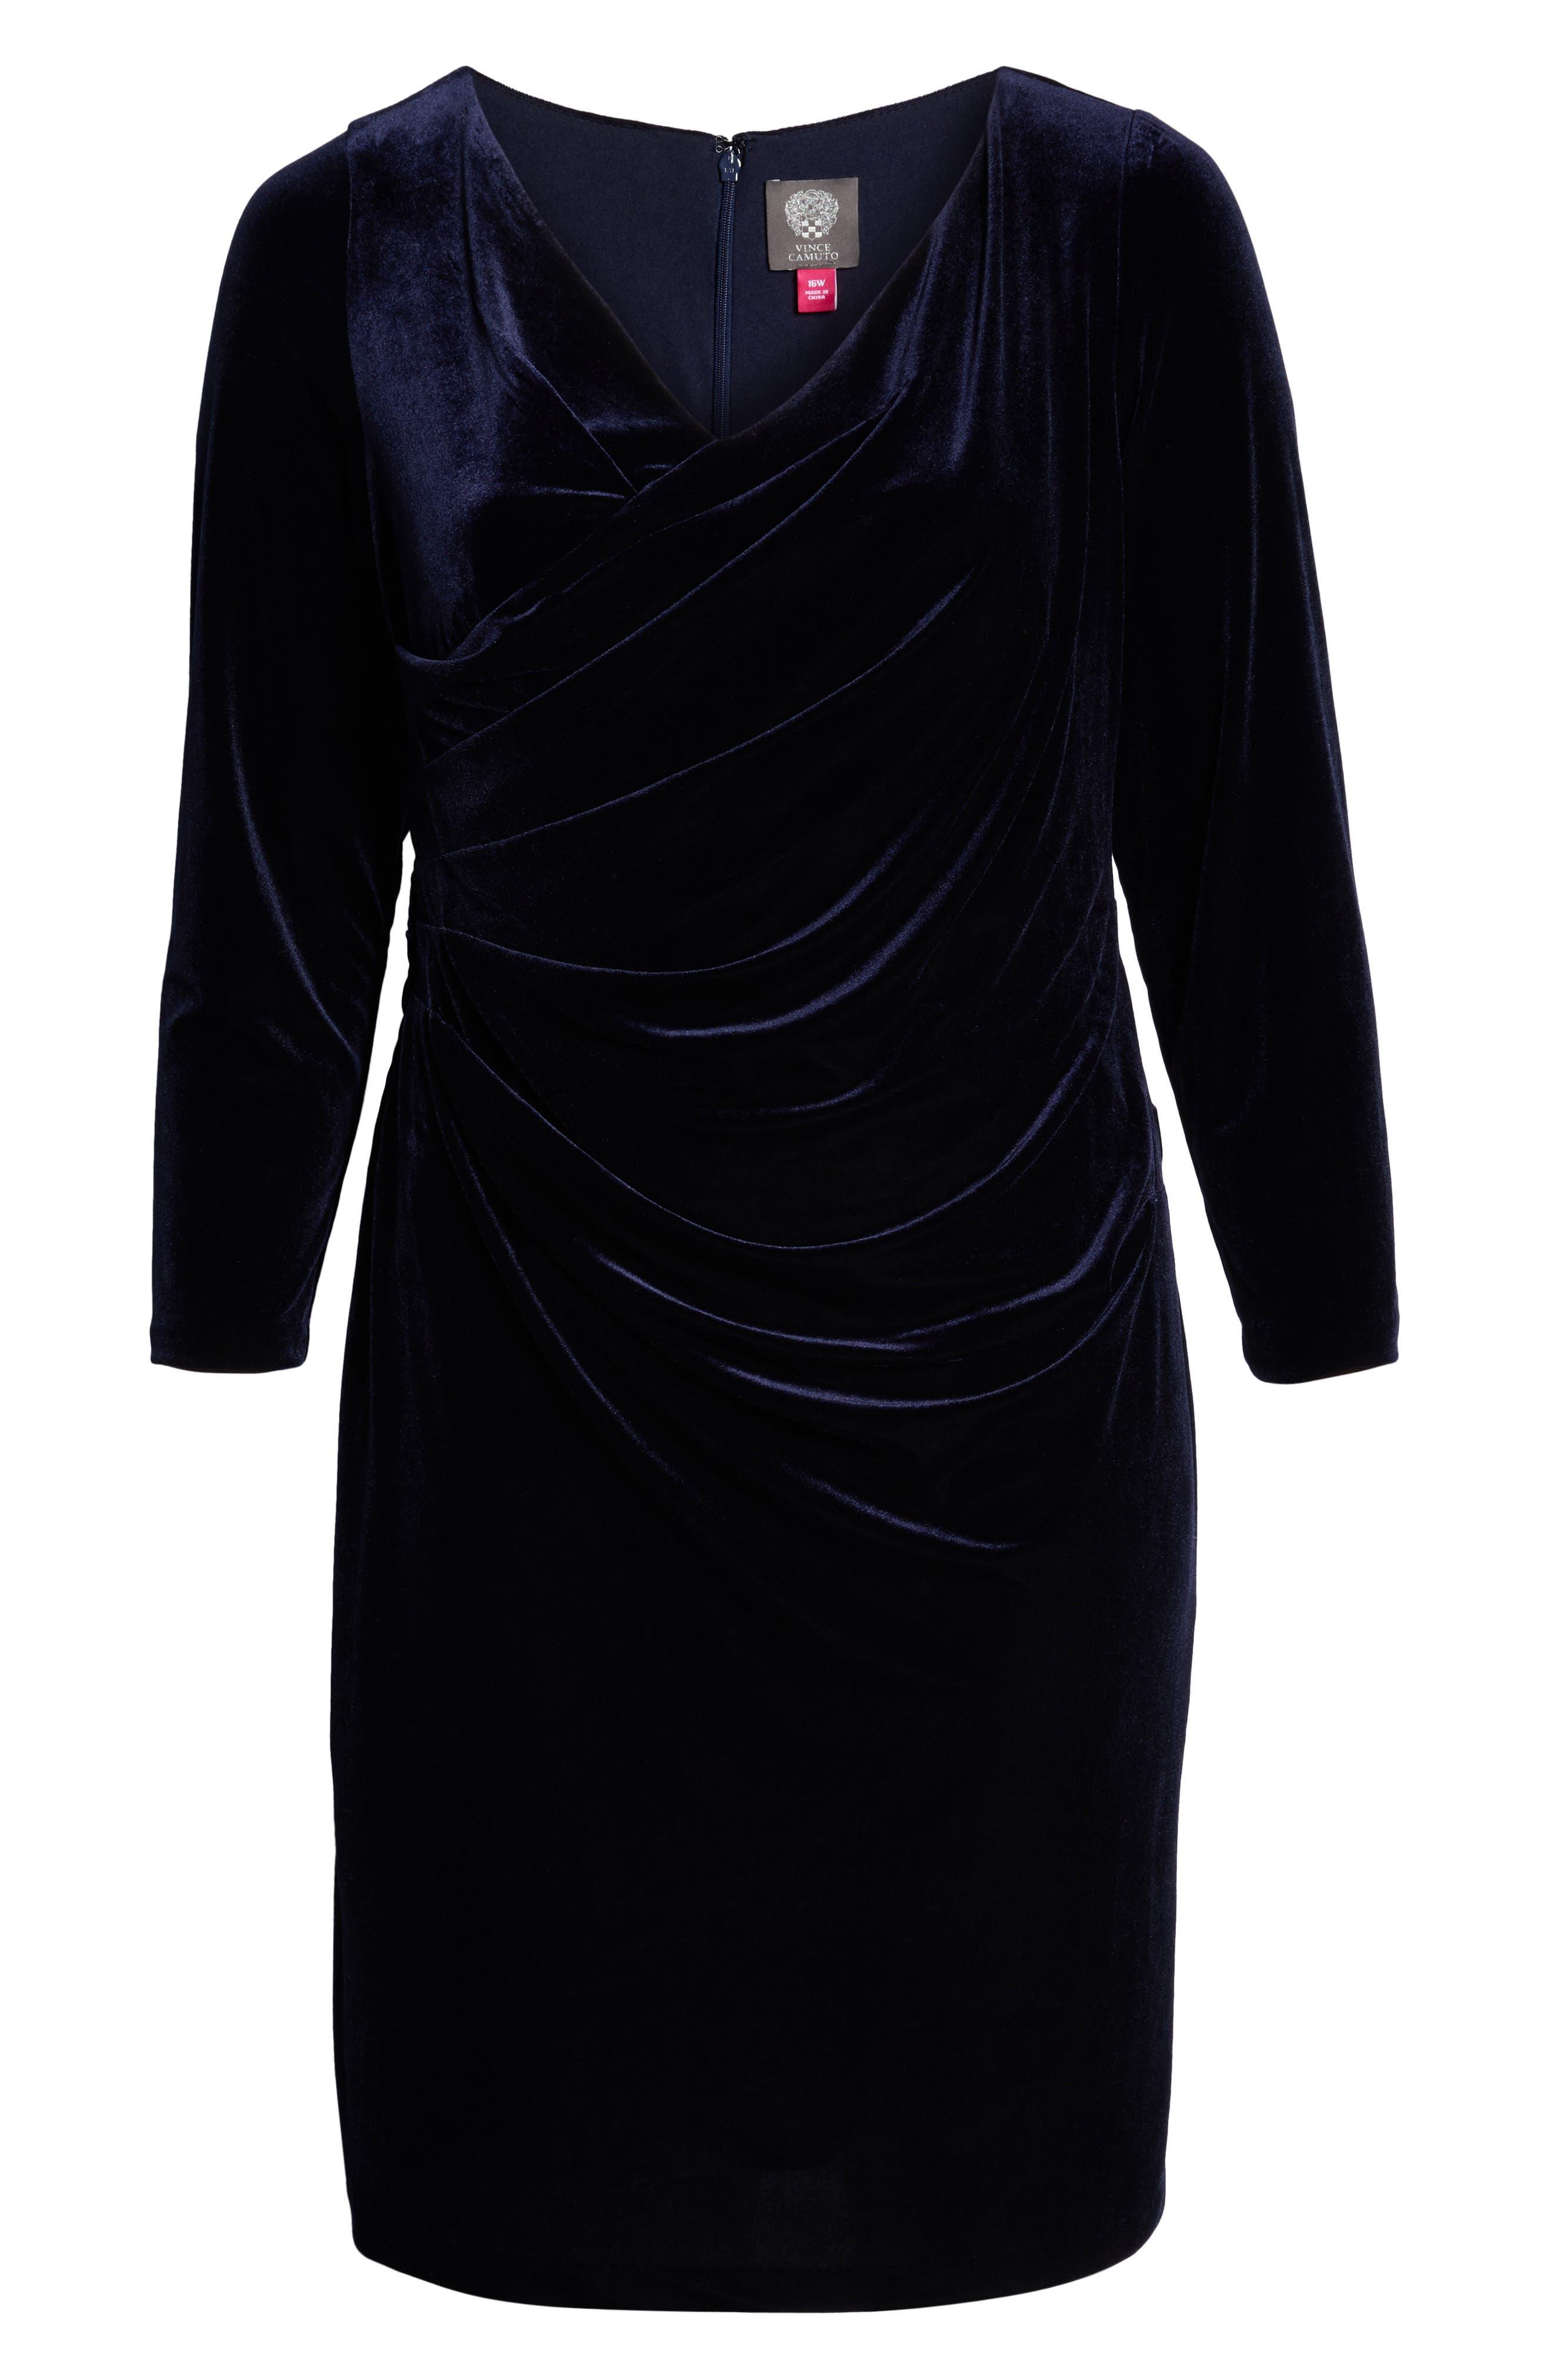 VINCE CAMUTO, Midi Dress, Alternate thumbnail 7, color, 410